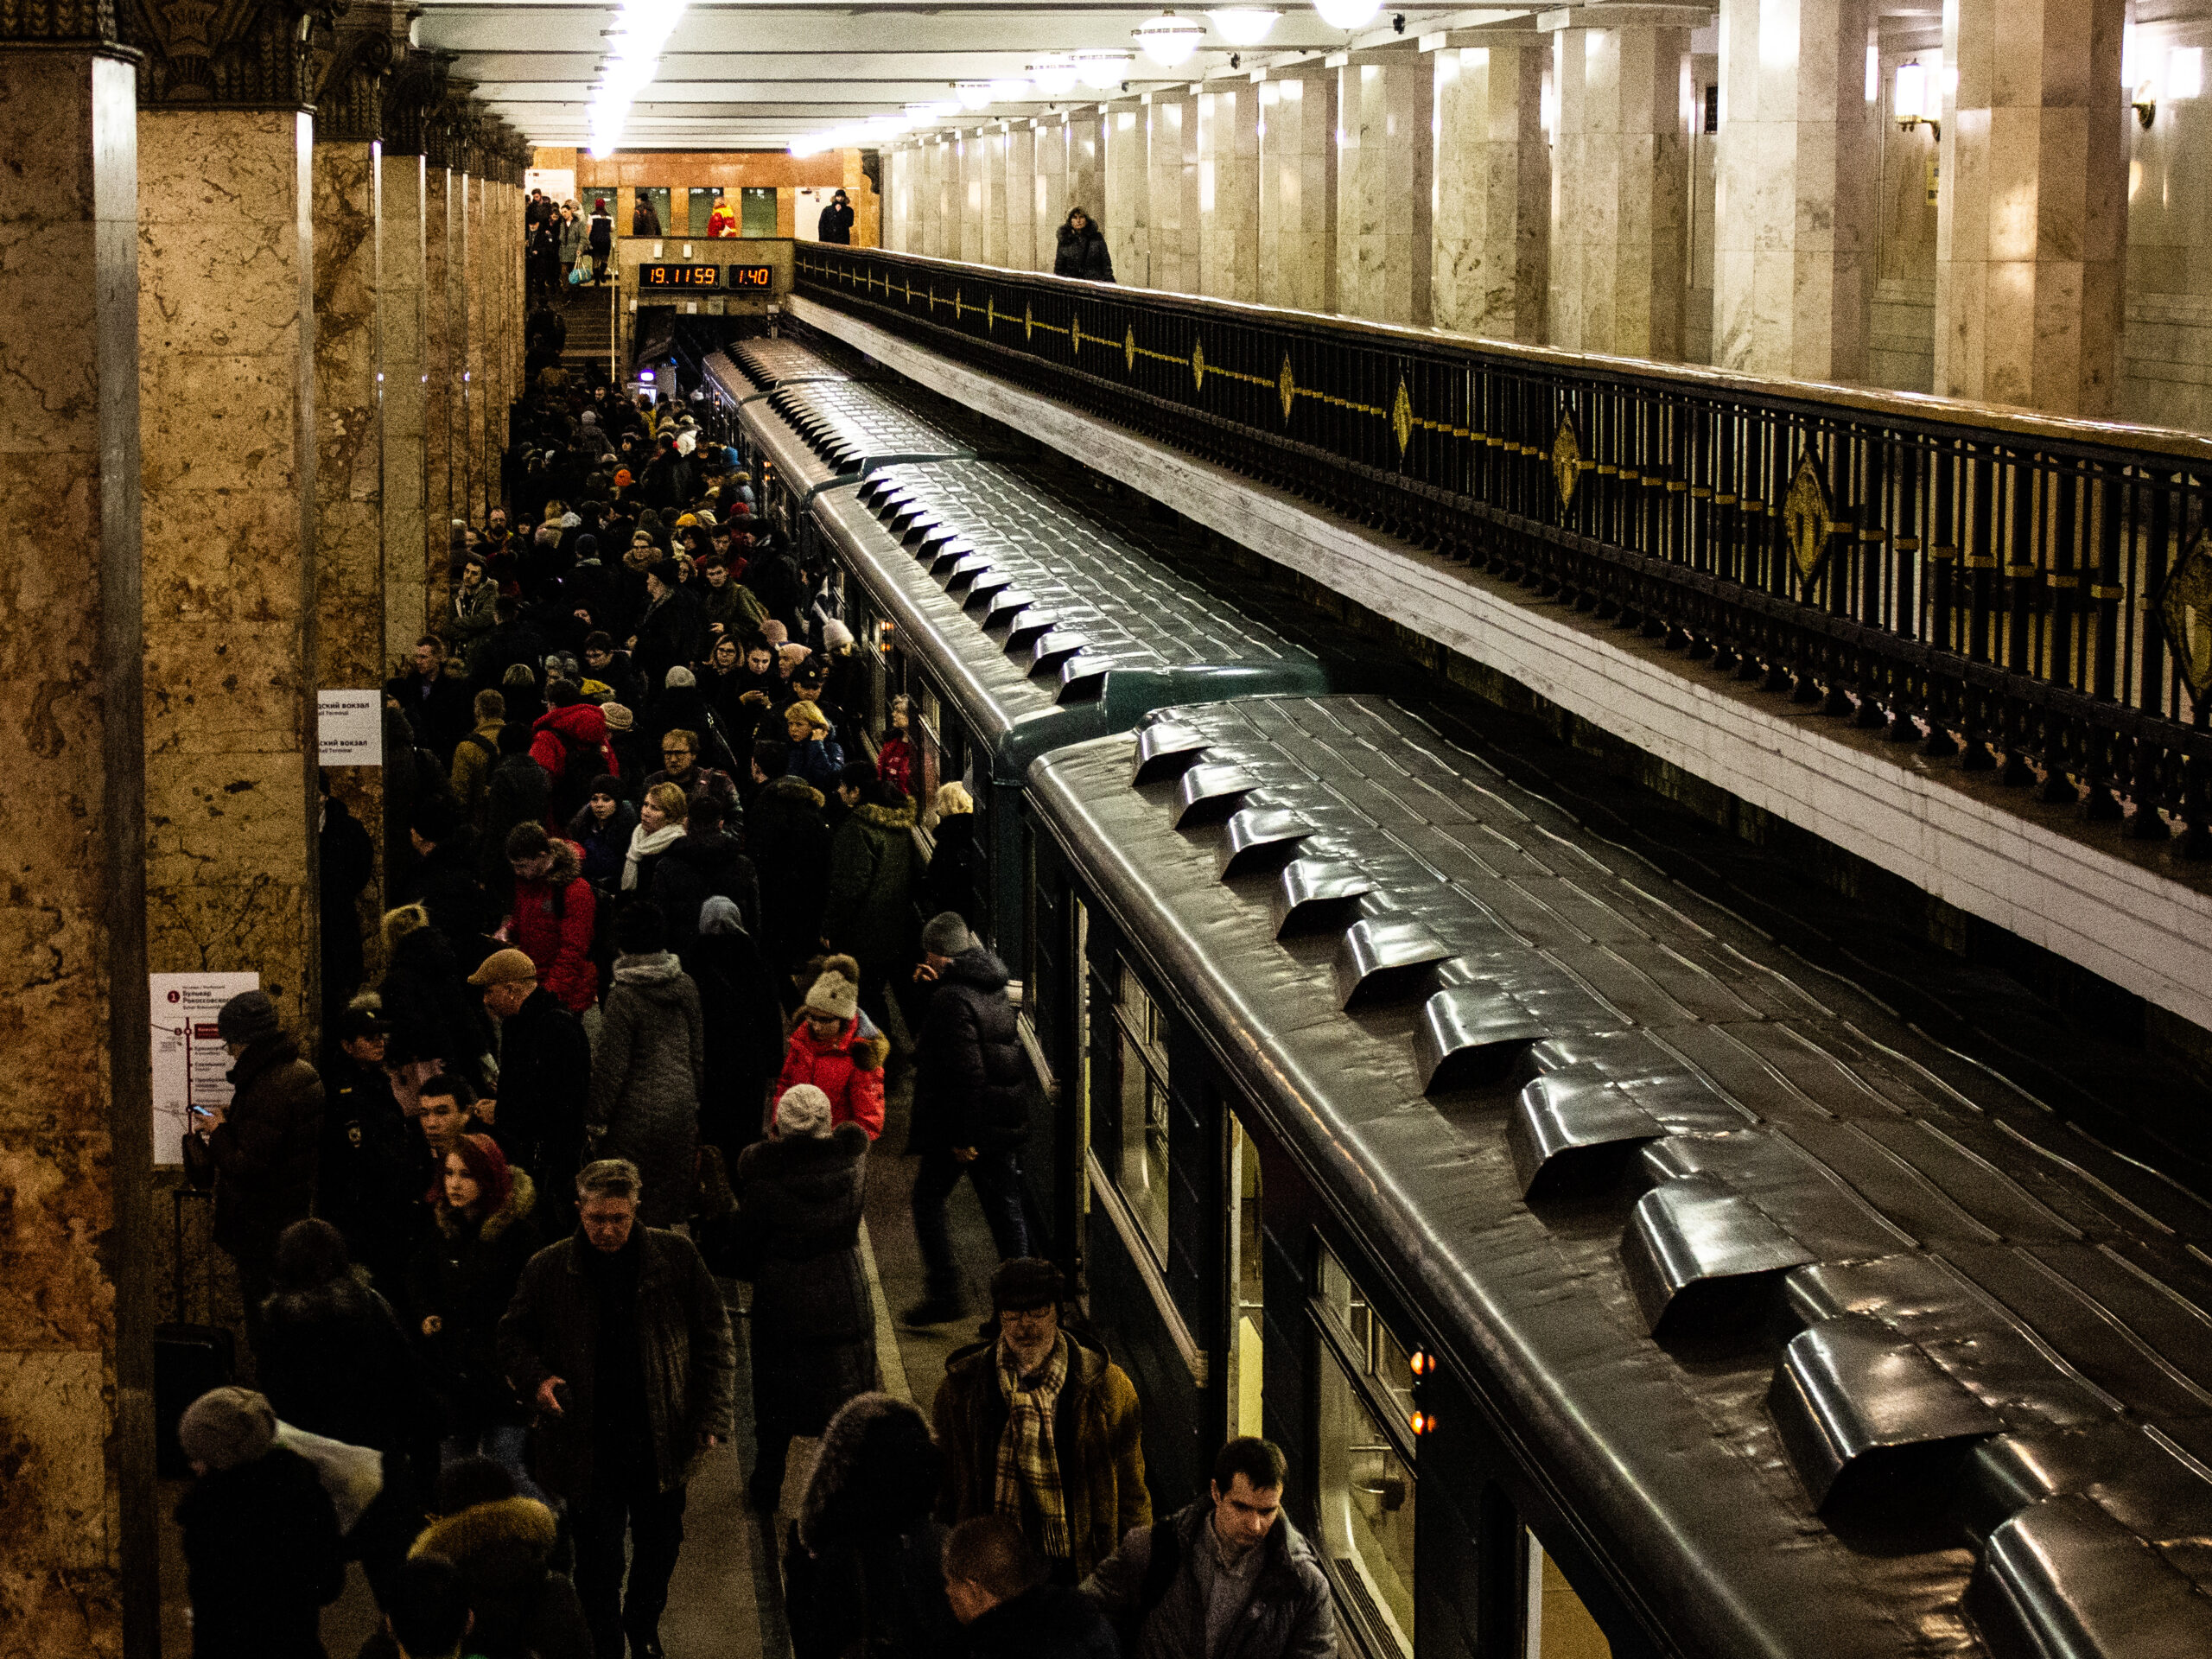 Metro i moskva